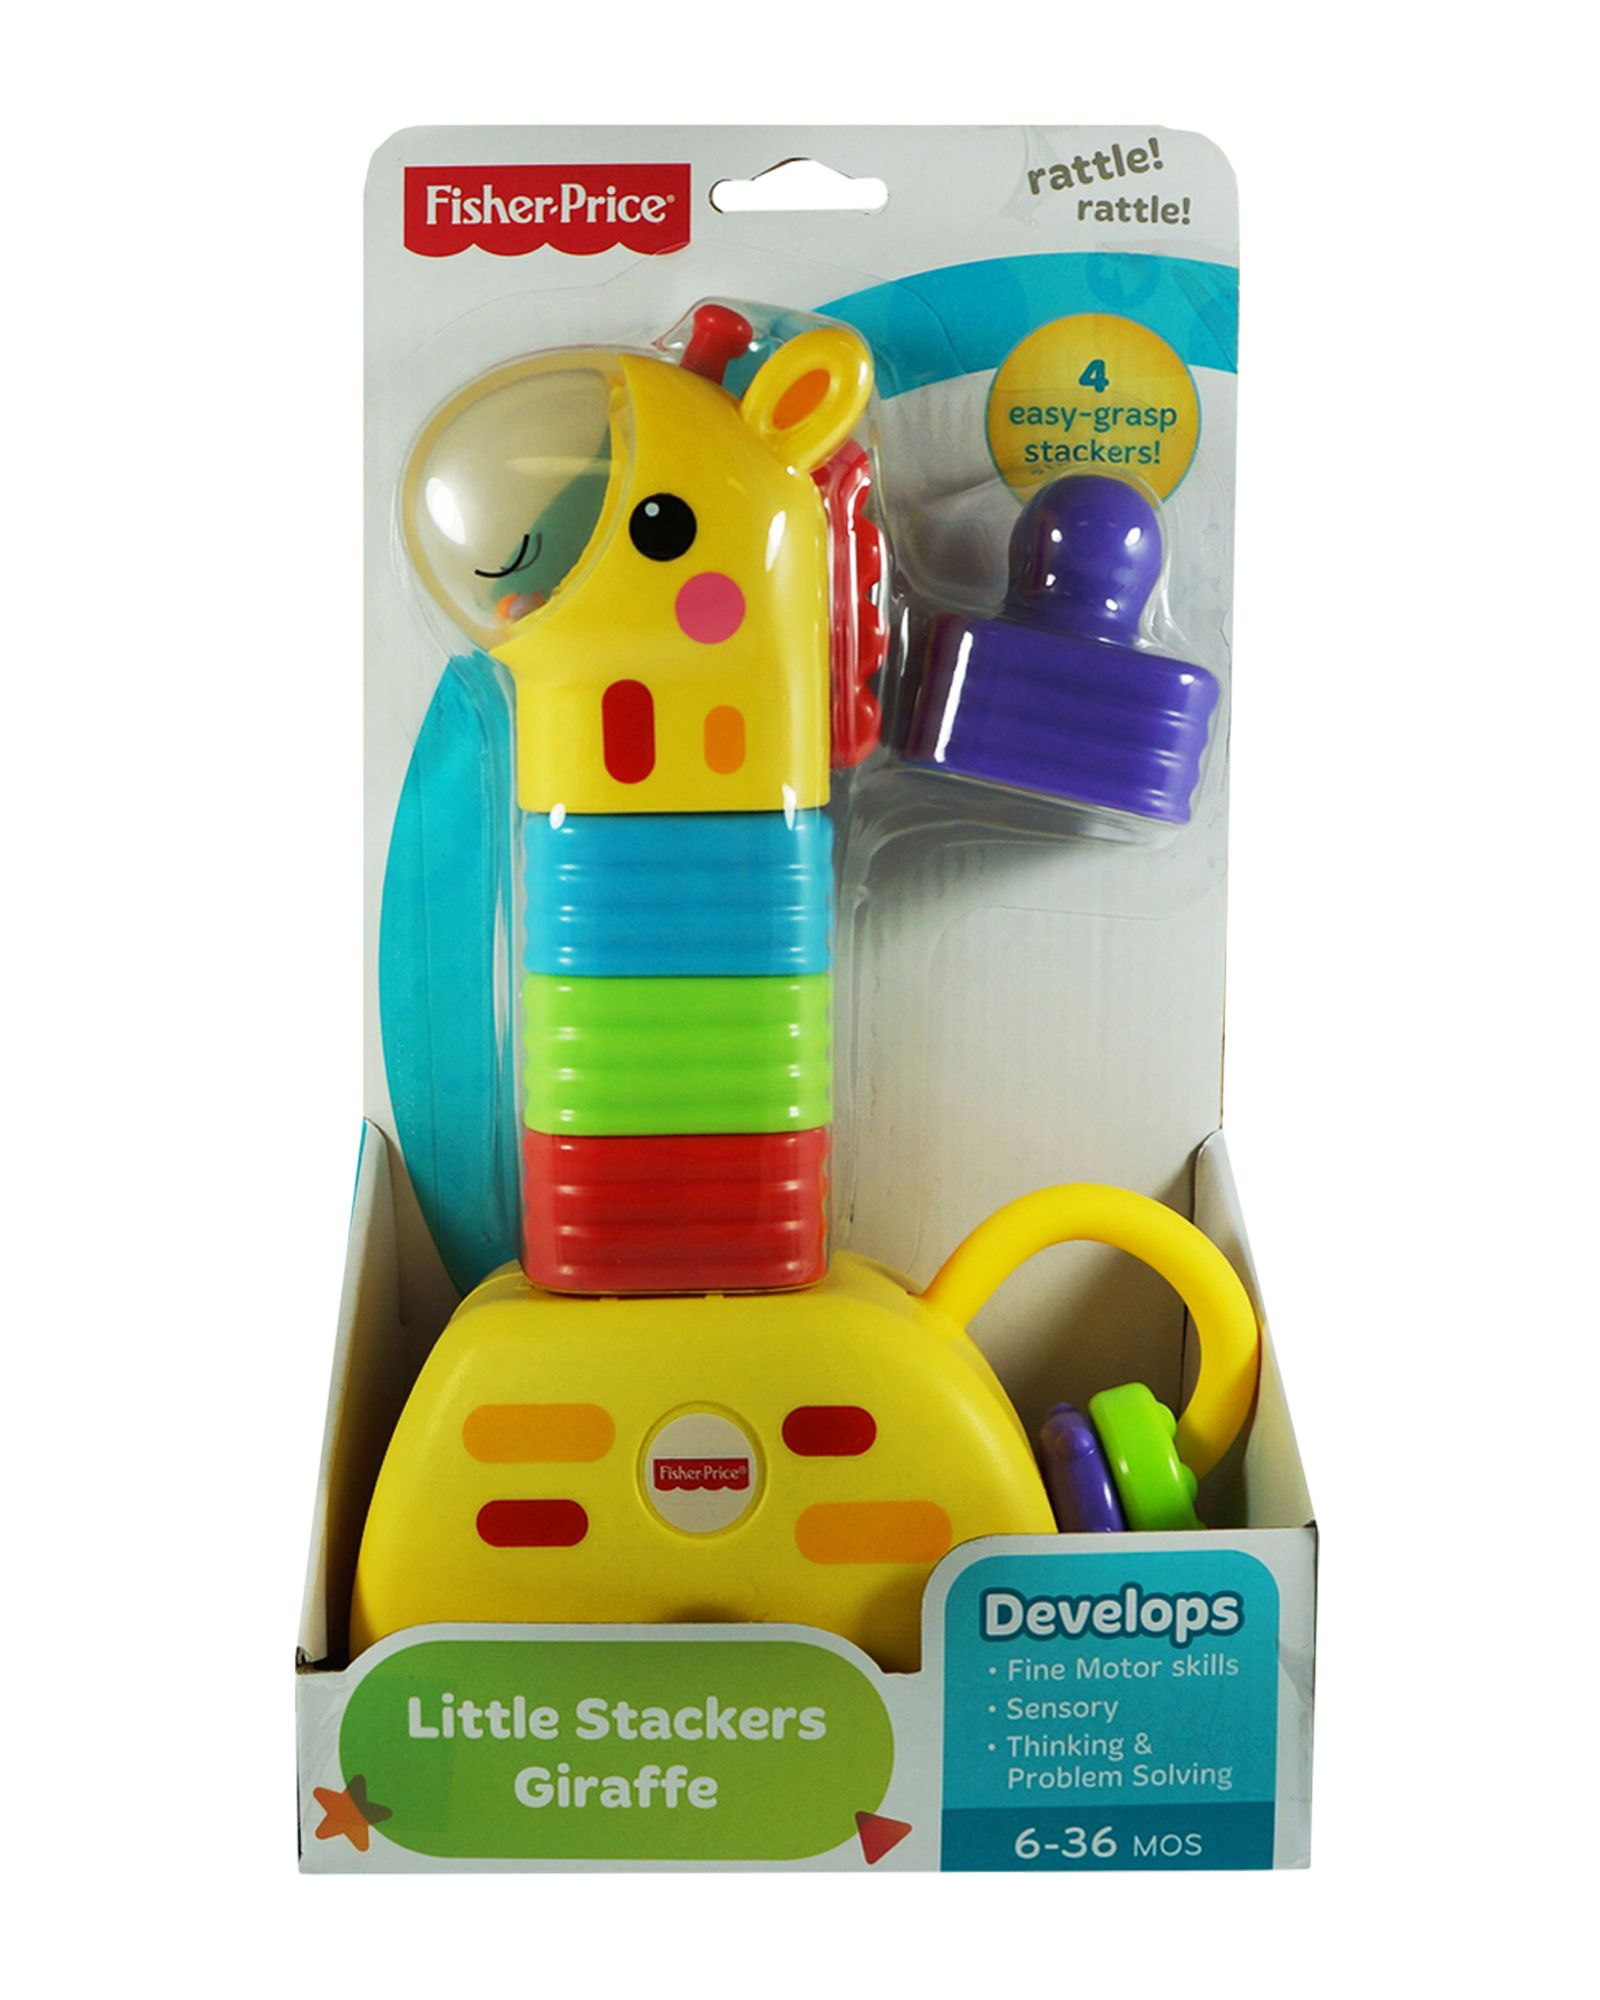 Fisher-Price Little Stackers Giraffe